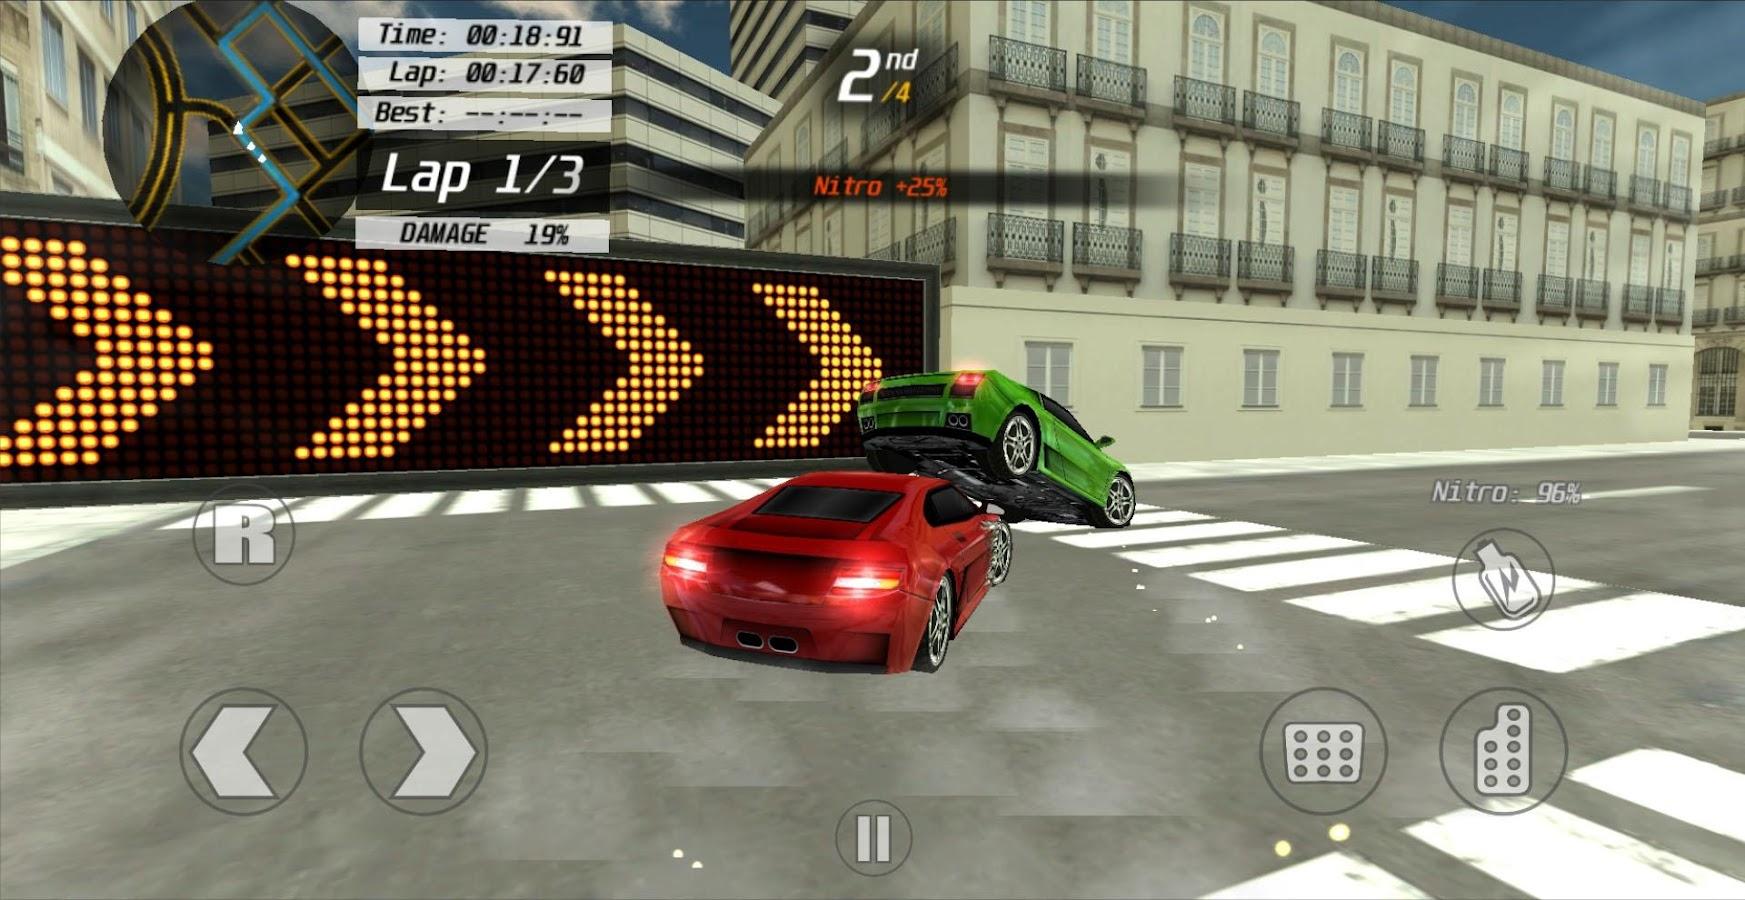 3d street racing 2 screenshot